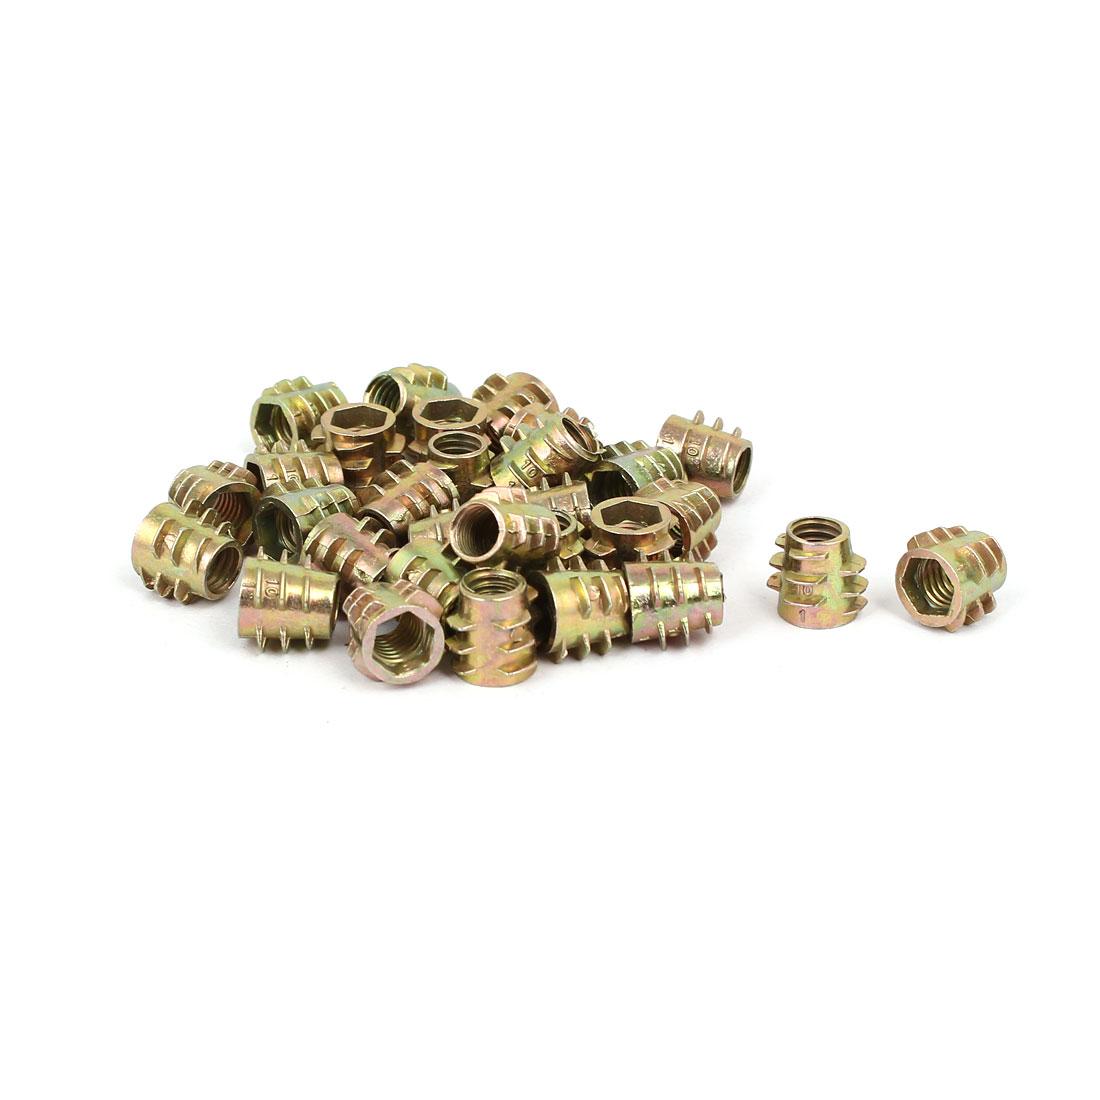 Wood Furniture Zinc Alloy Hex Socket Insert Screws E-Nuts M6x10mm 30pcs